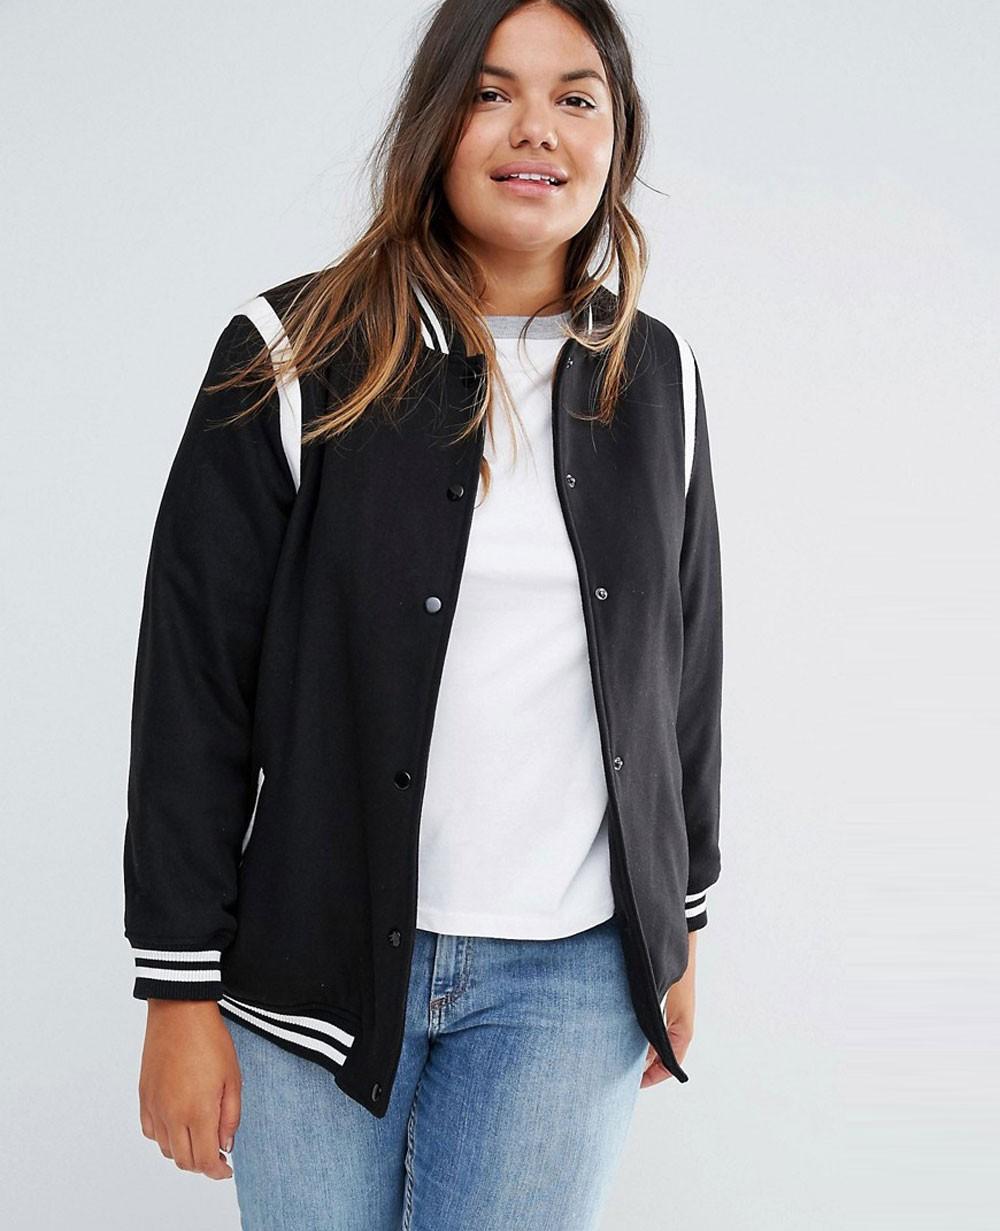 Leather jacket new look - Leather Jacket New Look 51